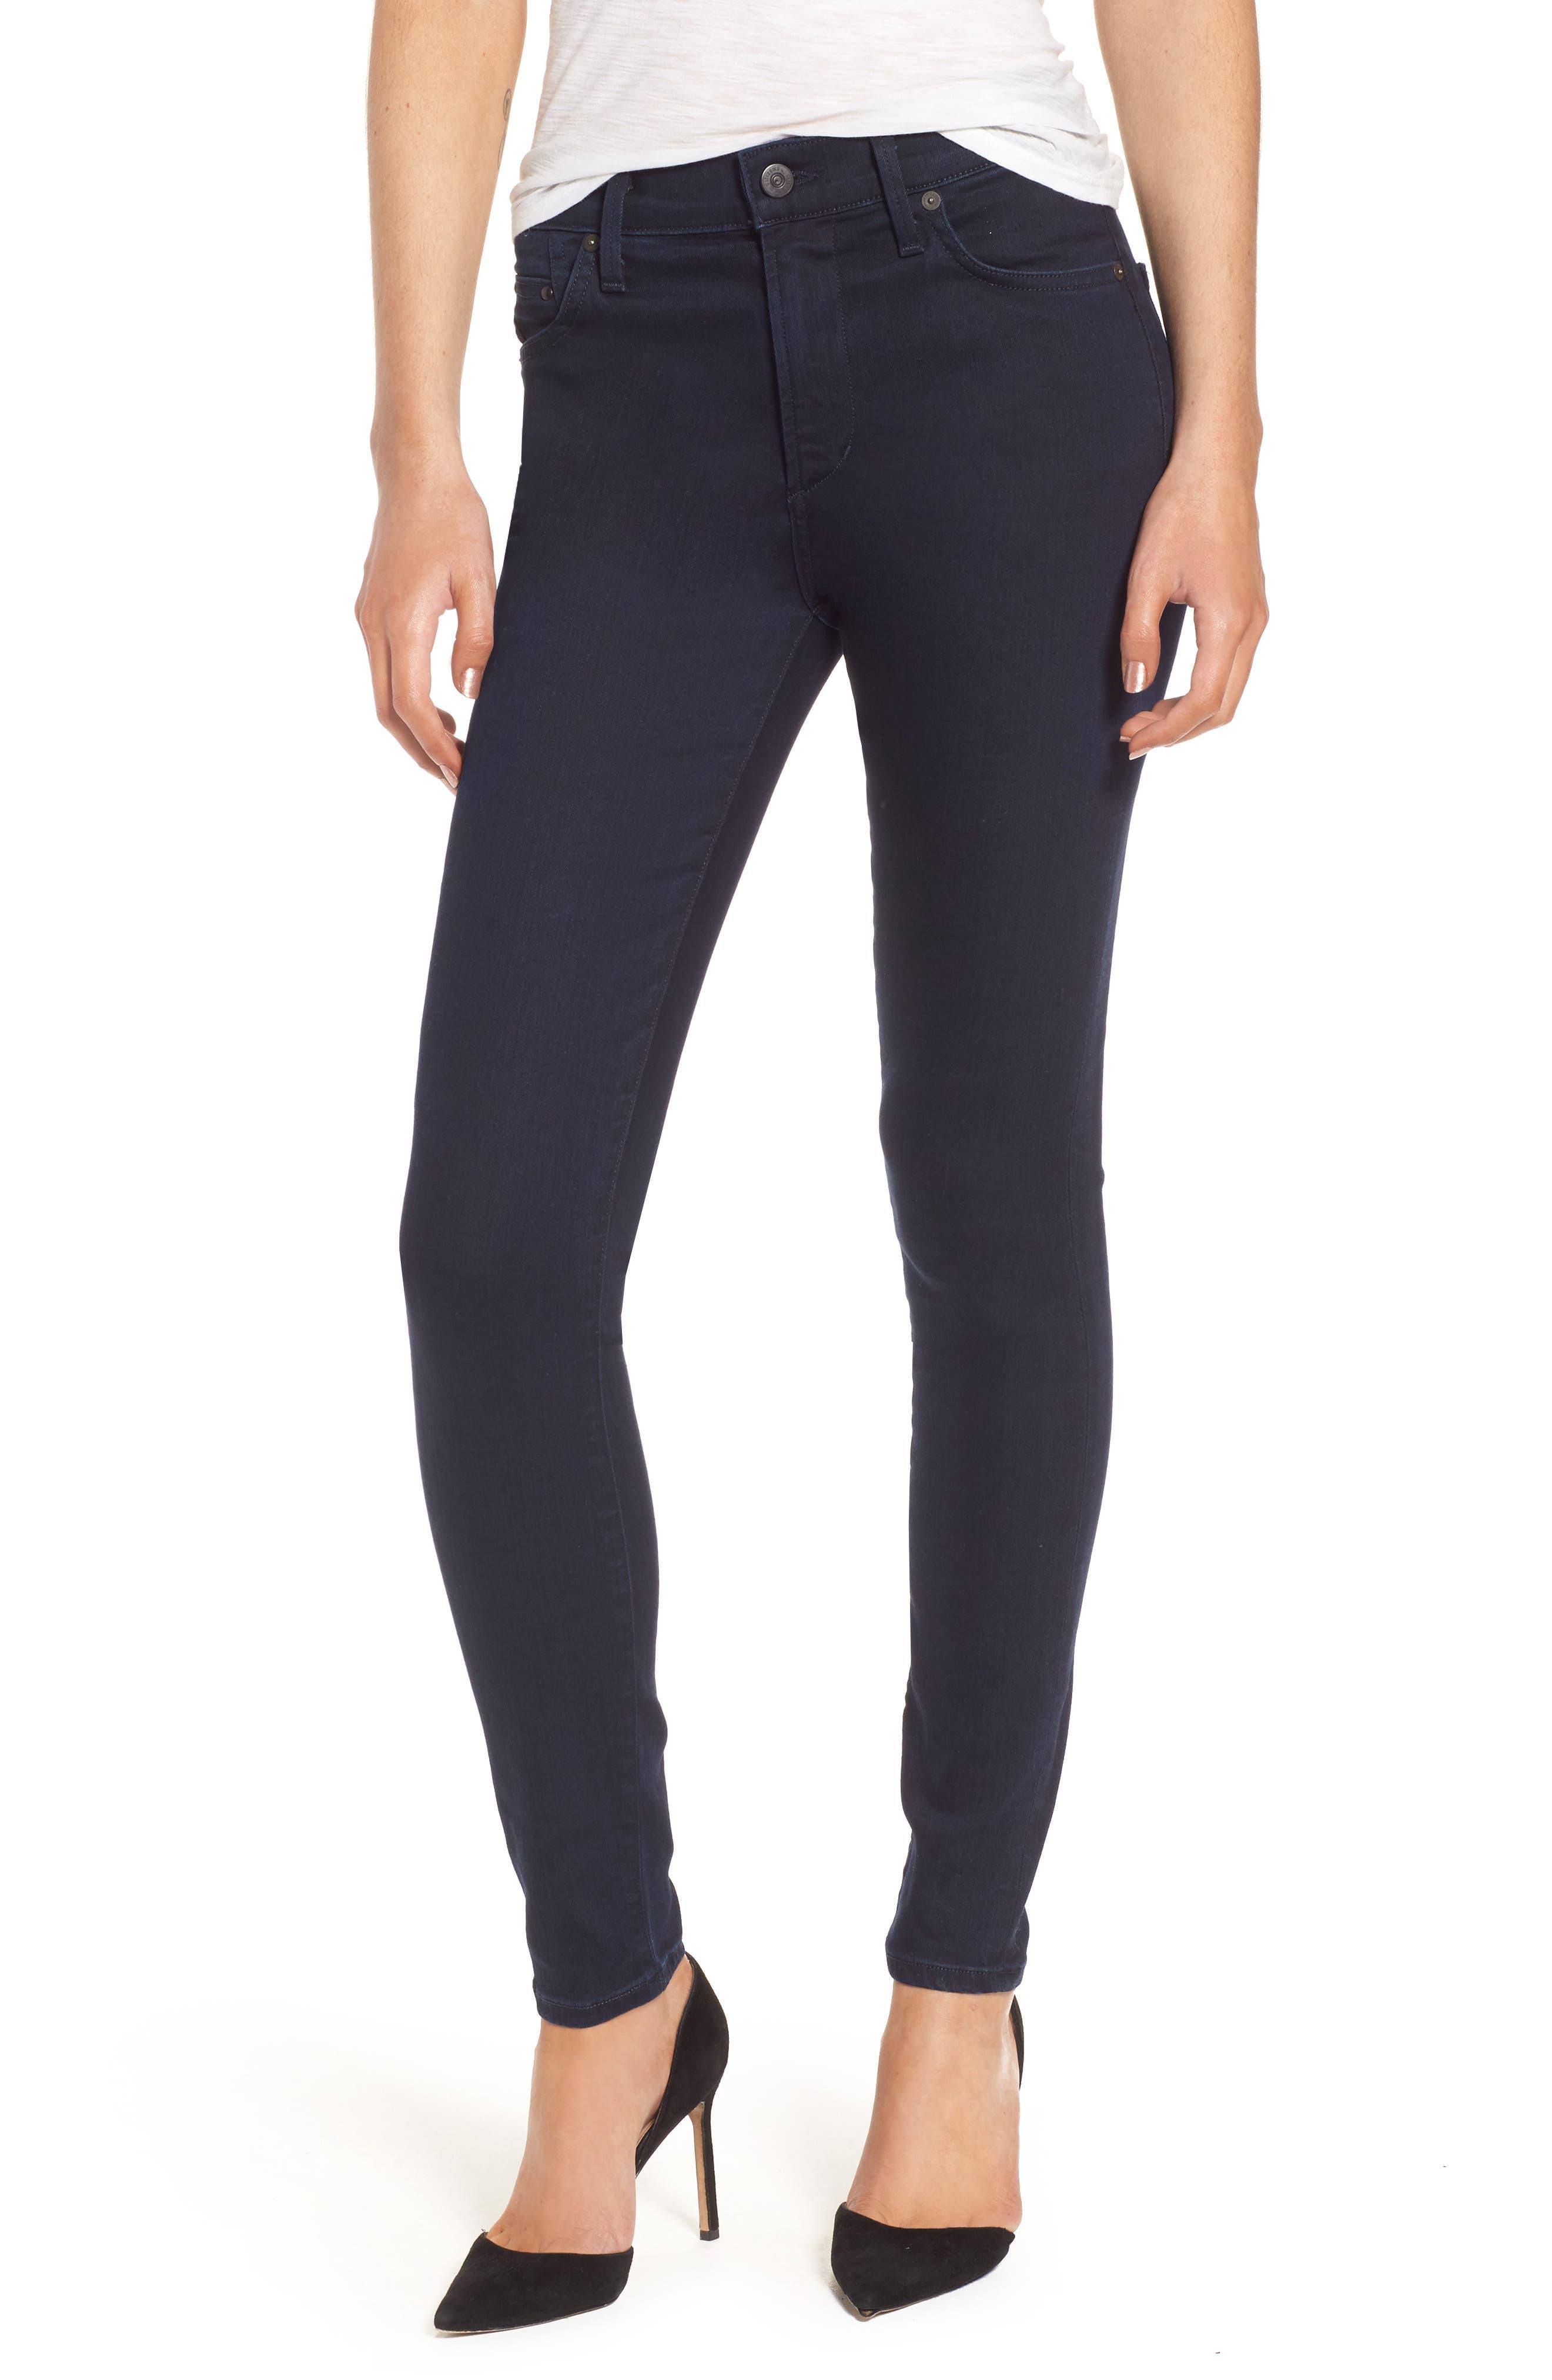 Rocket High Waist Skinny Jeans,                             Main thumbnail 1, color,                             409